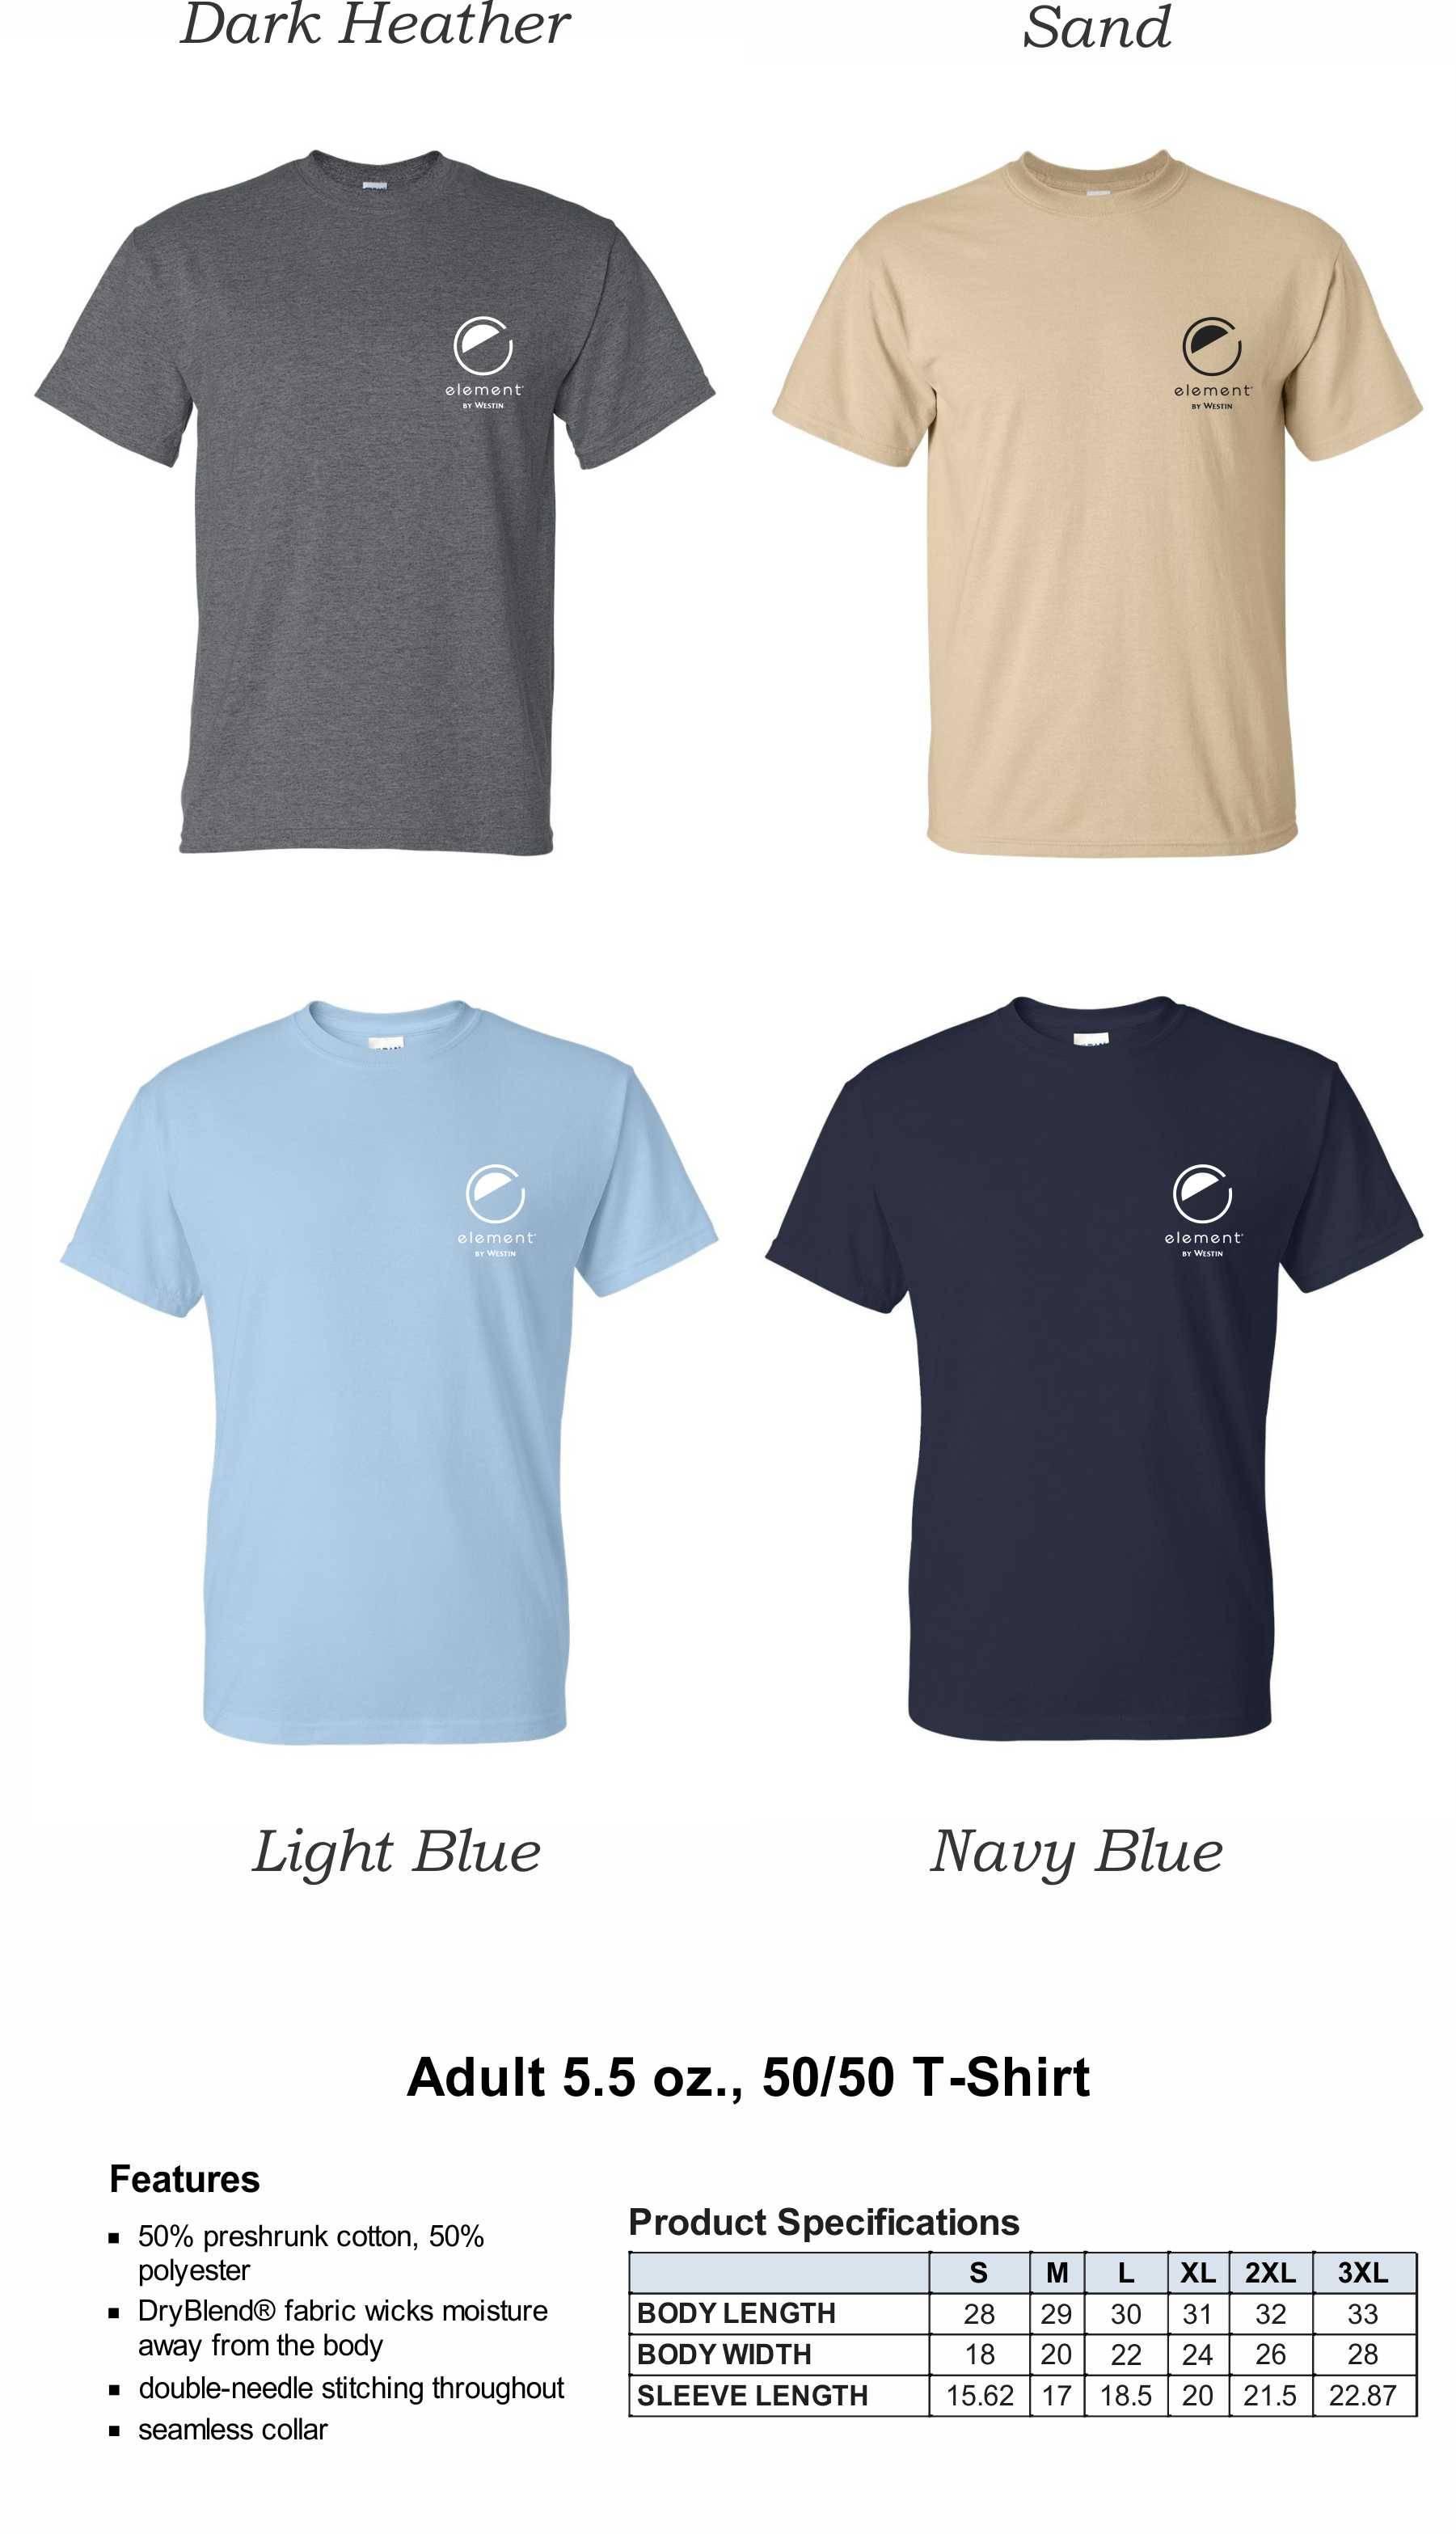 T-Shirts, HeavyWeight 50/50 DryBlend Fabric   Silk-Screen Logo